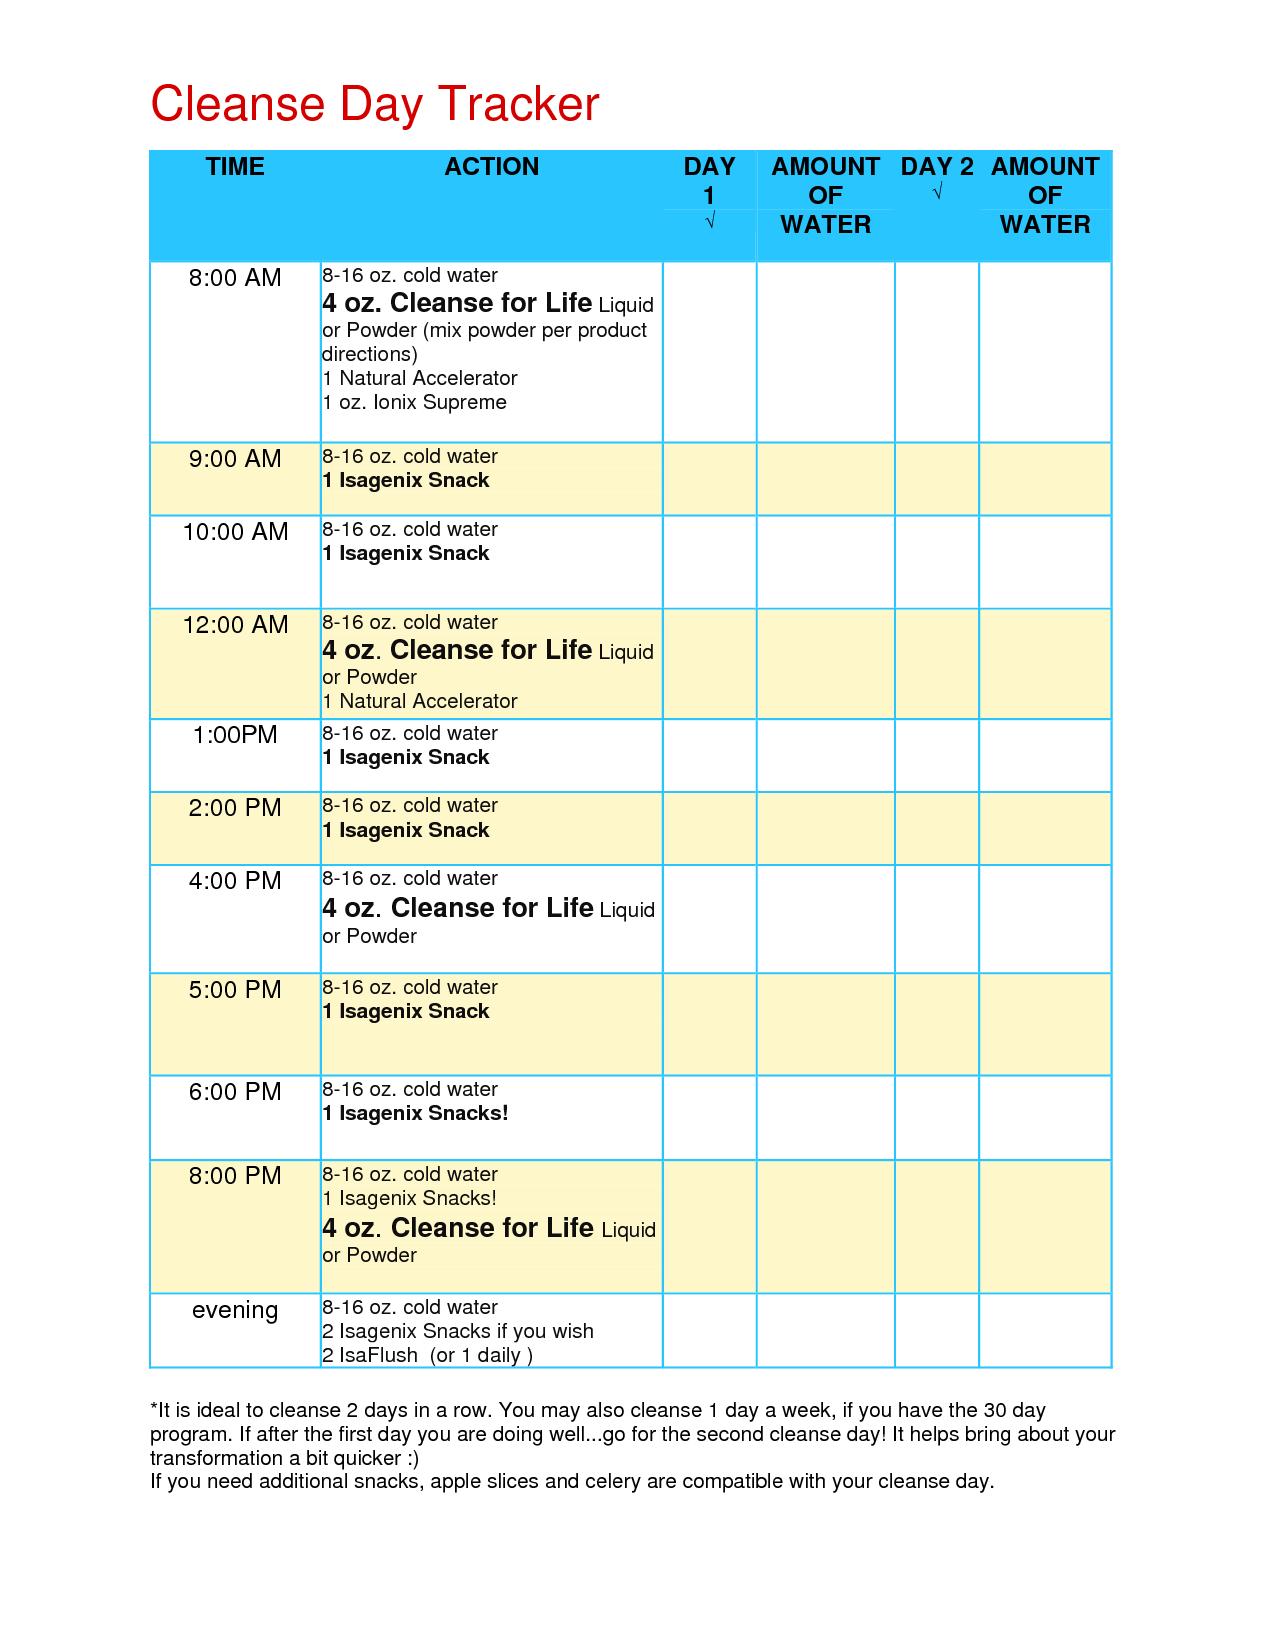 Cleanse Day Tracker | Isagenix Cleanse, Isagenix Snacks Pertaining To Isagenix Schedule For 30 Days